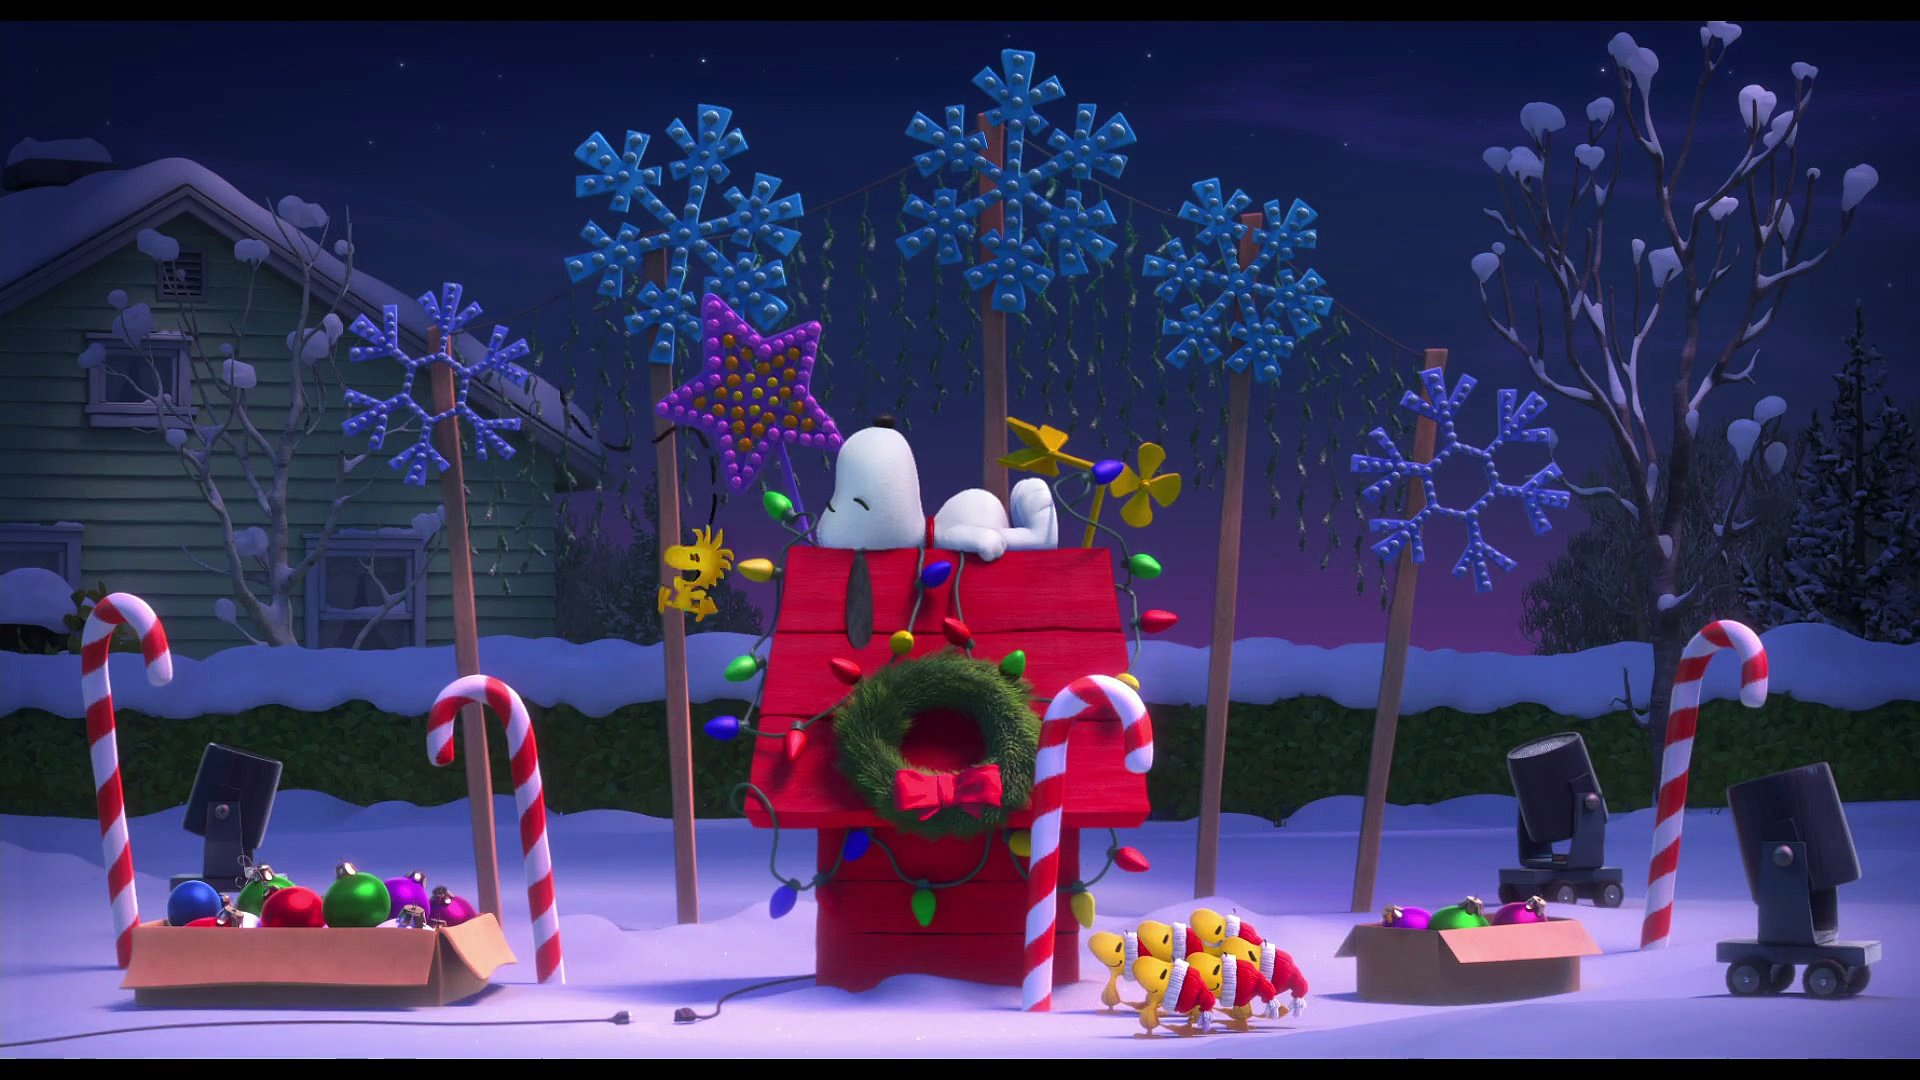 PEANUTS MOVIE animation family snoopy comedy cgi wallpaper 1920x1080 1920x1080